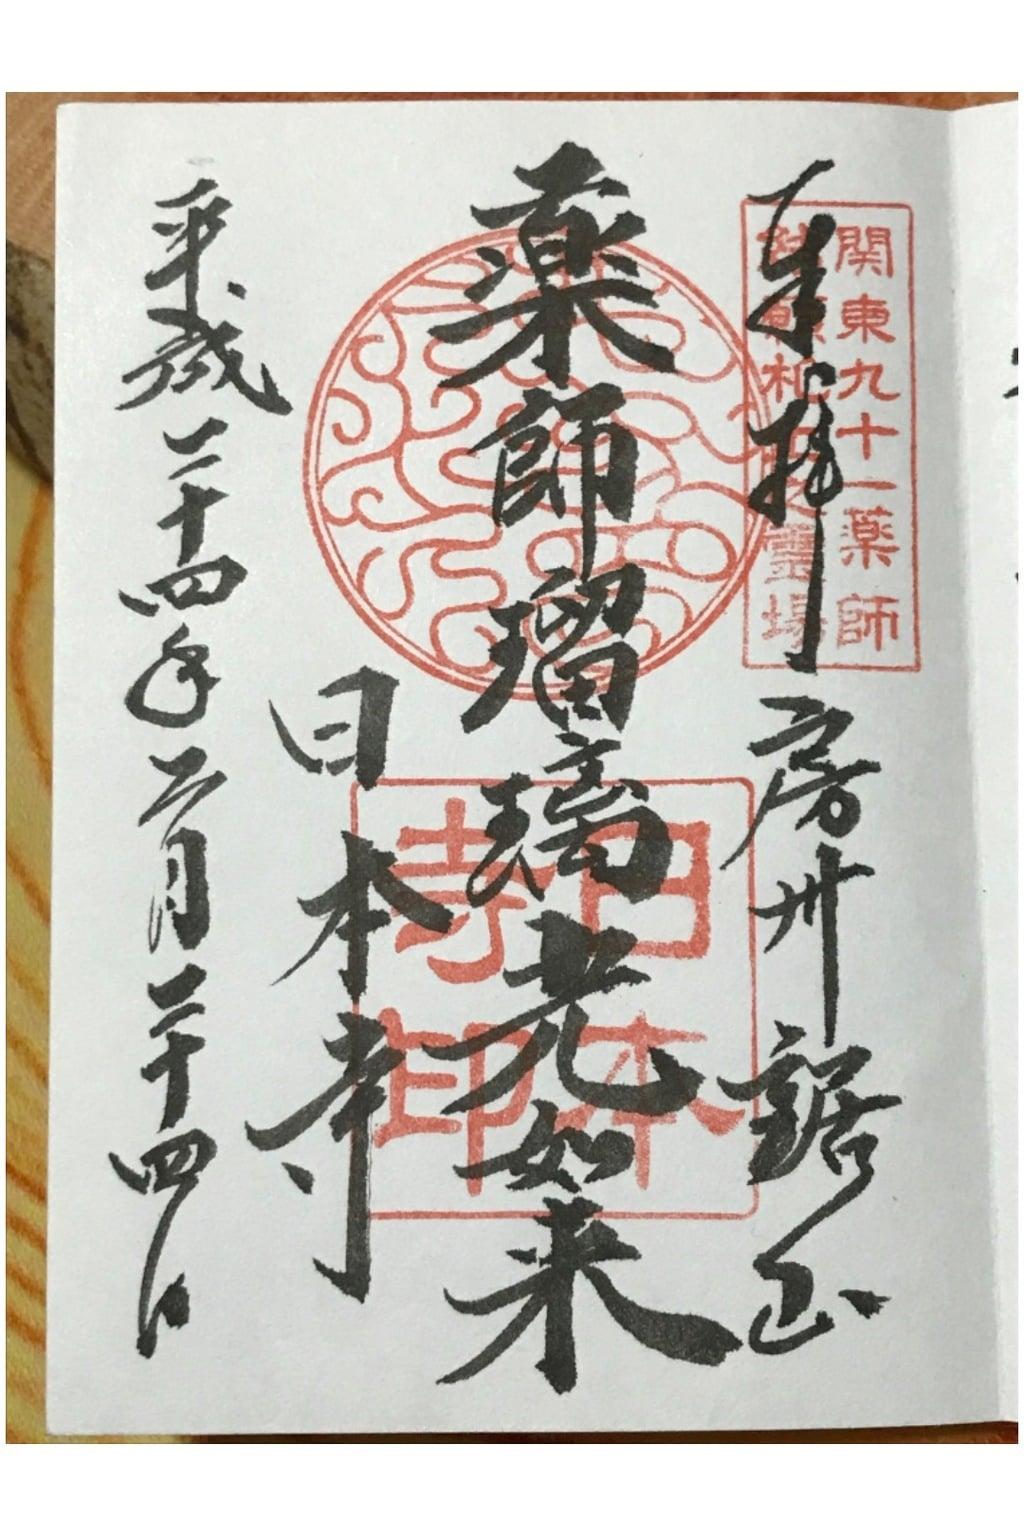 日本寺の御朱印